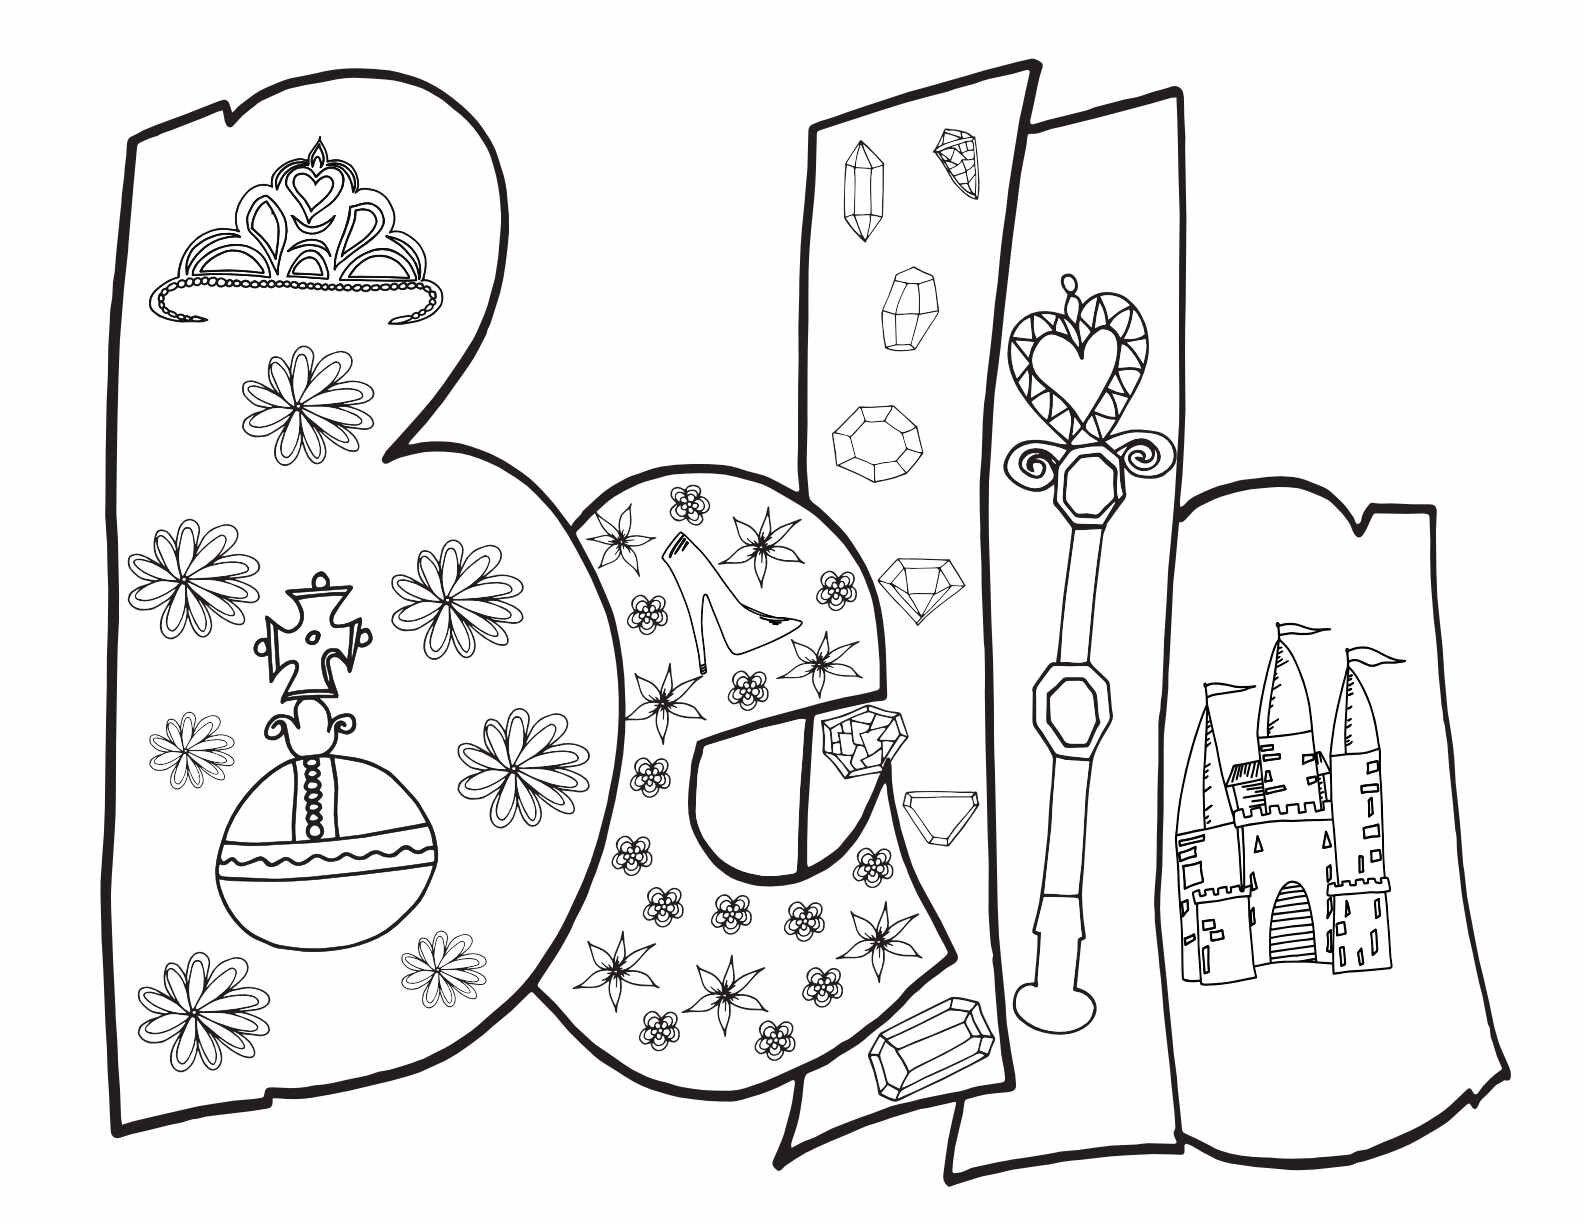 Bella Free Printable Princess Coloring Page Stevie Doodles Princess Coloring Pages Bee Coloring Pages Candy Coloring Pages